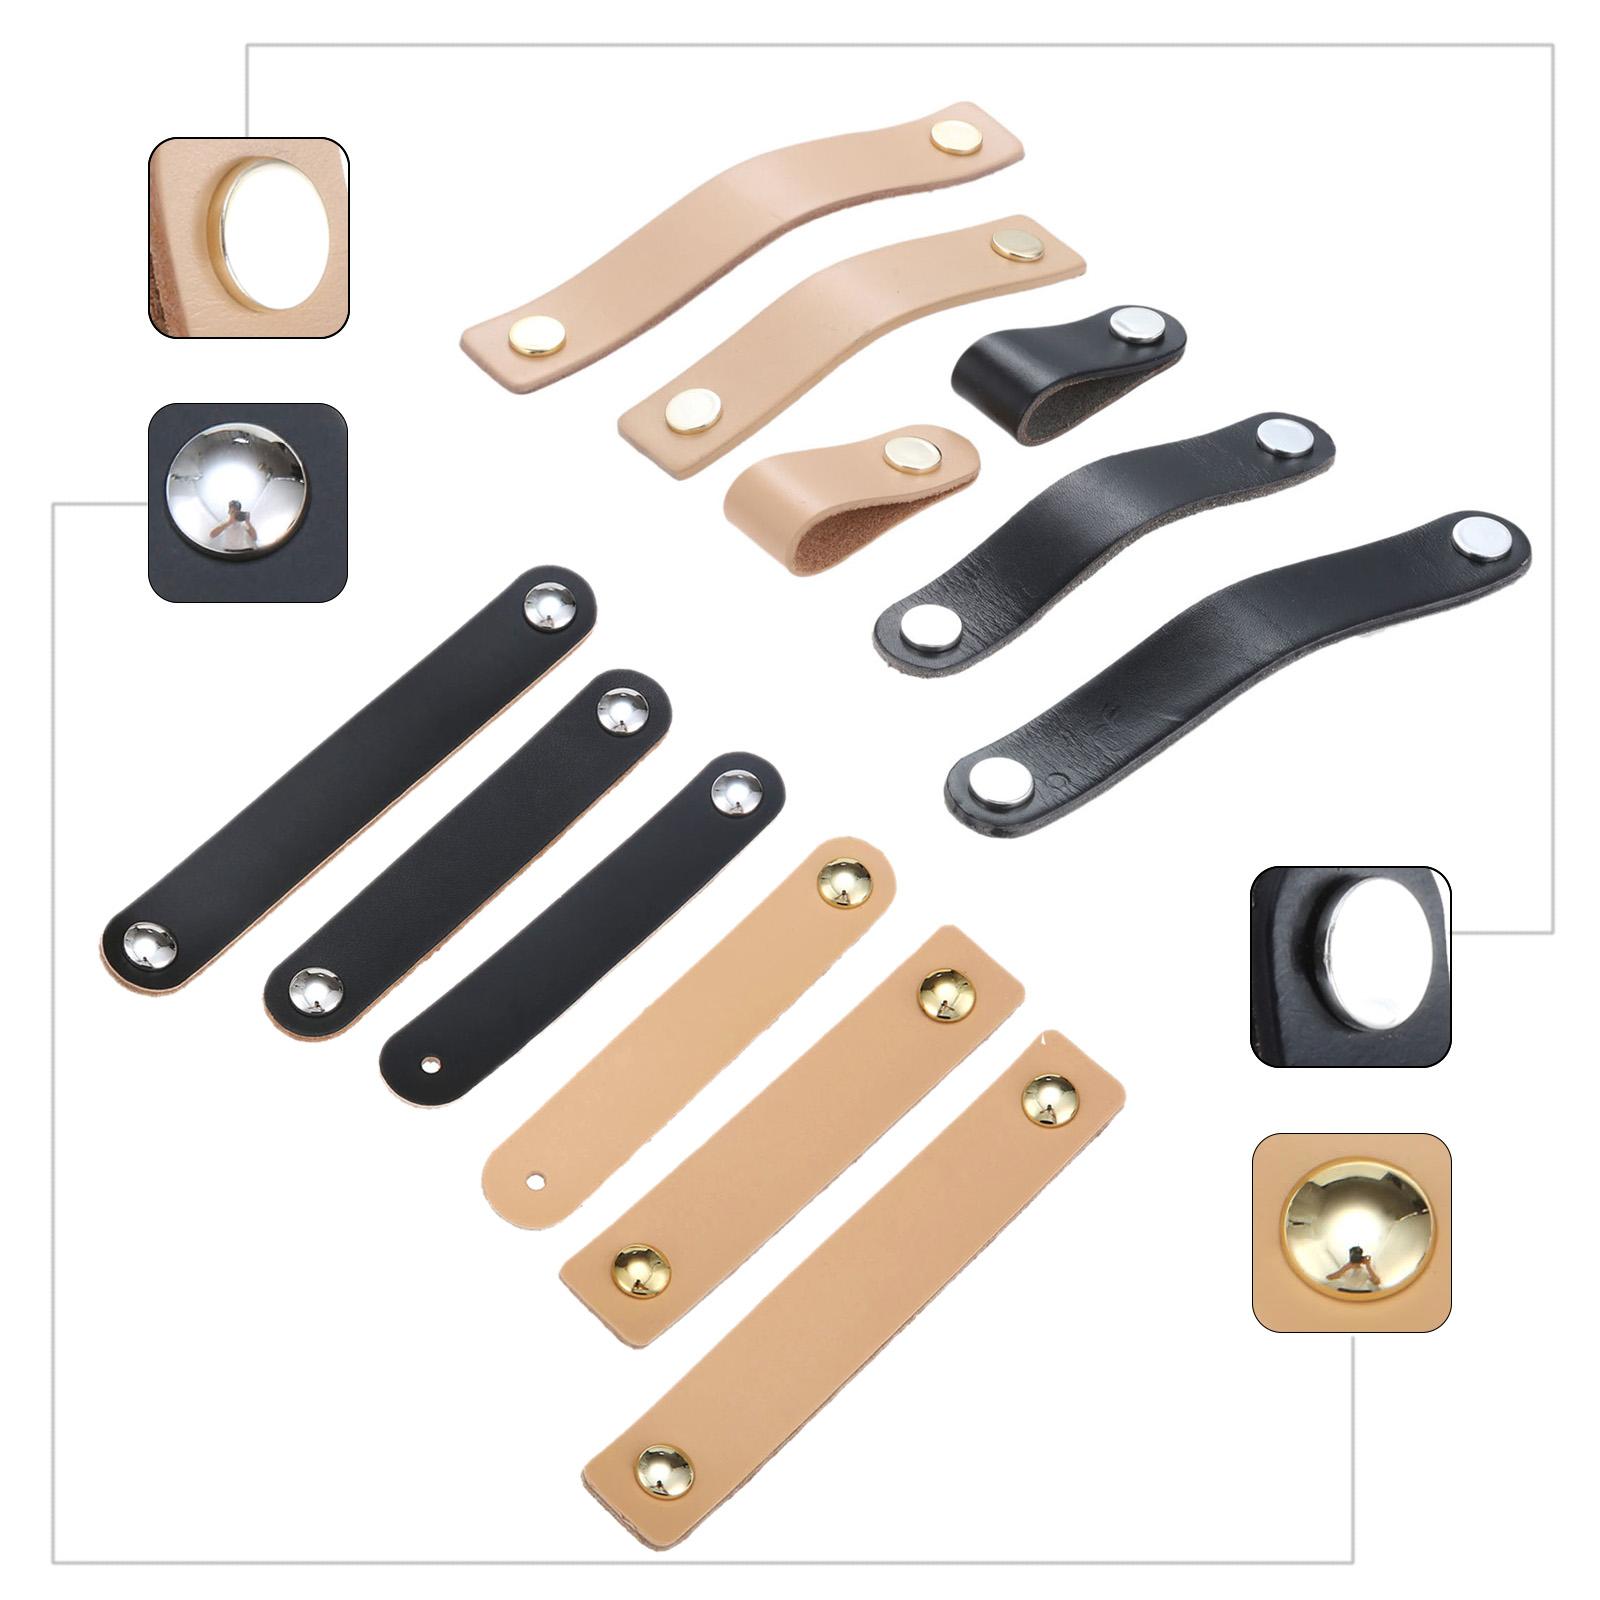 Rockwood 085751 107.32D Stainless Steel Straight Door Pull